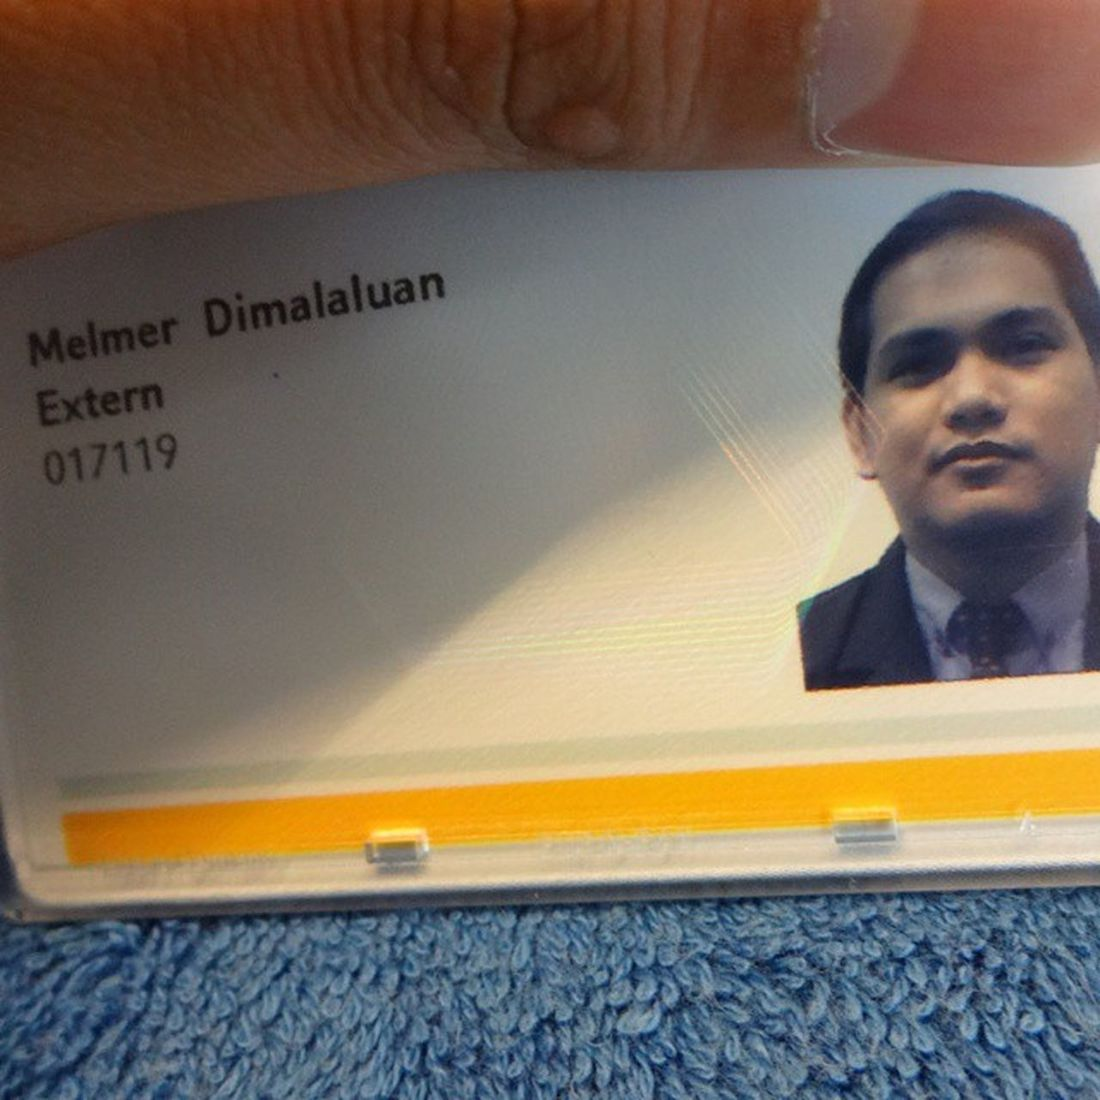 New ID, New Office, New Name?? Haha. EndOfThirdWeek